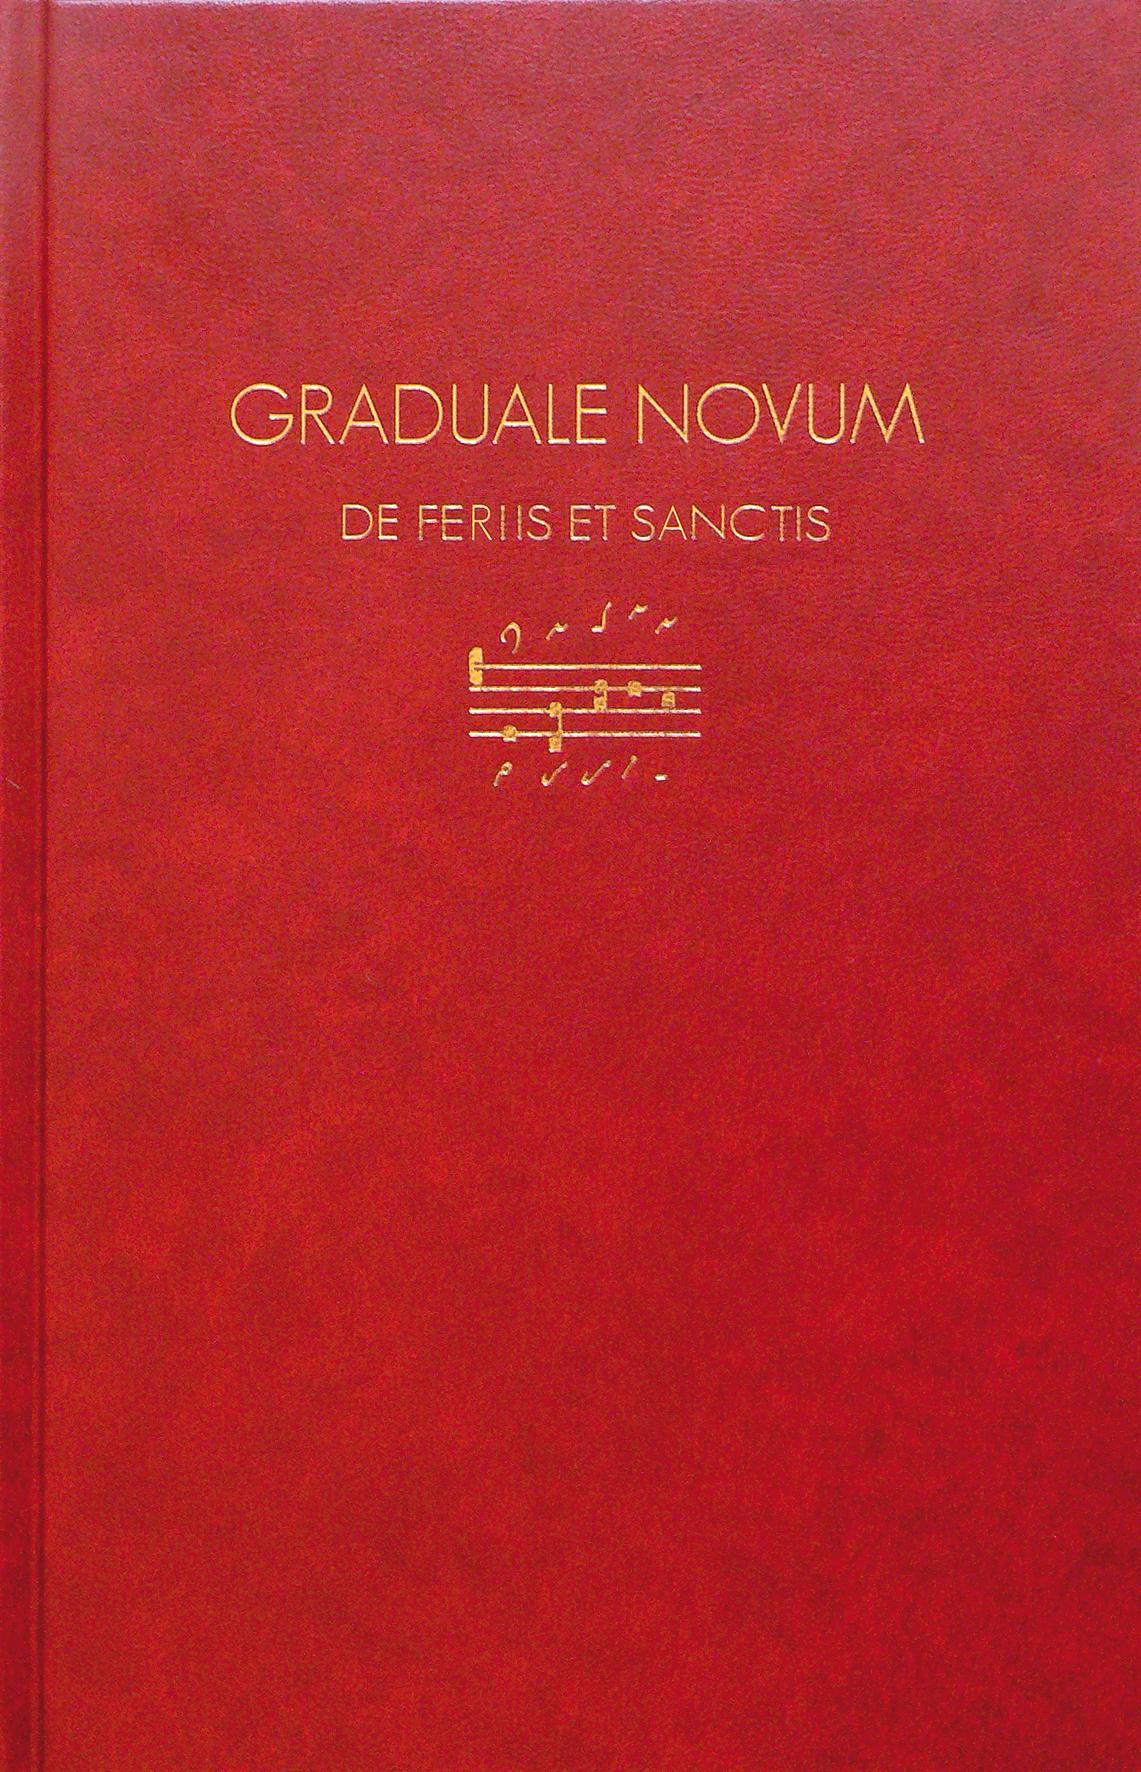 Graduale Novum  Editio magis critica iuxta SC 117  Tomus II: De Feriis Et Sanctis  Christian Dostal (u. a.)  Buch  Deutsch  2018 - Dostal, Christian